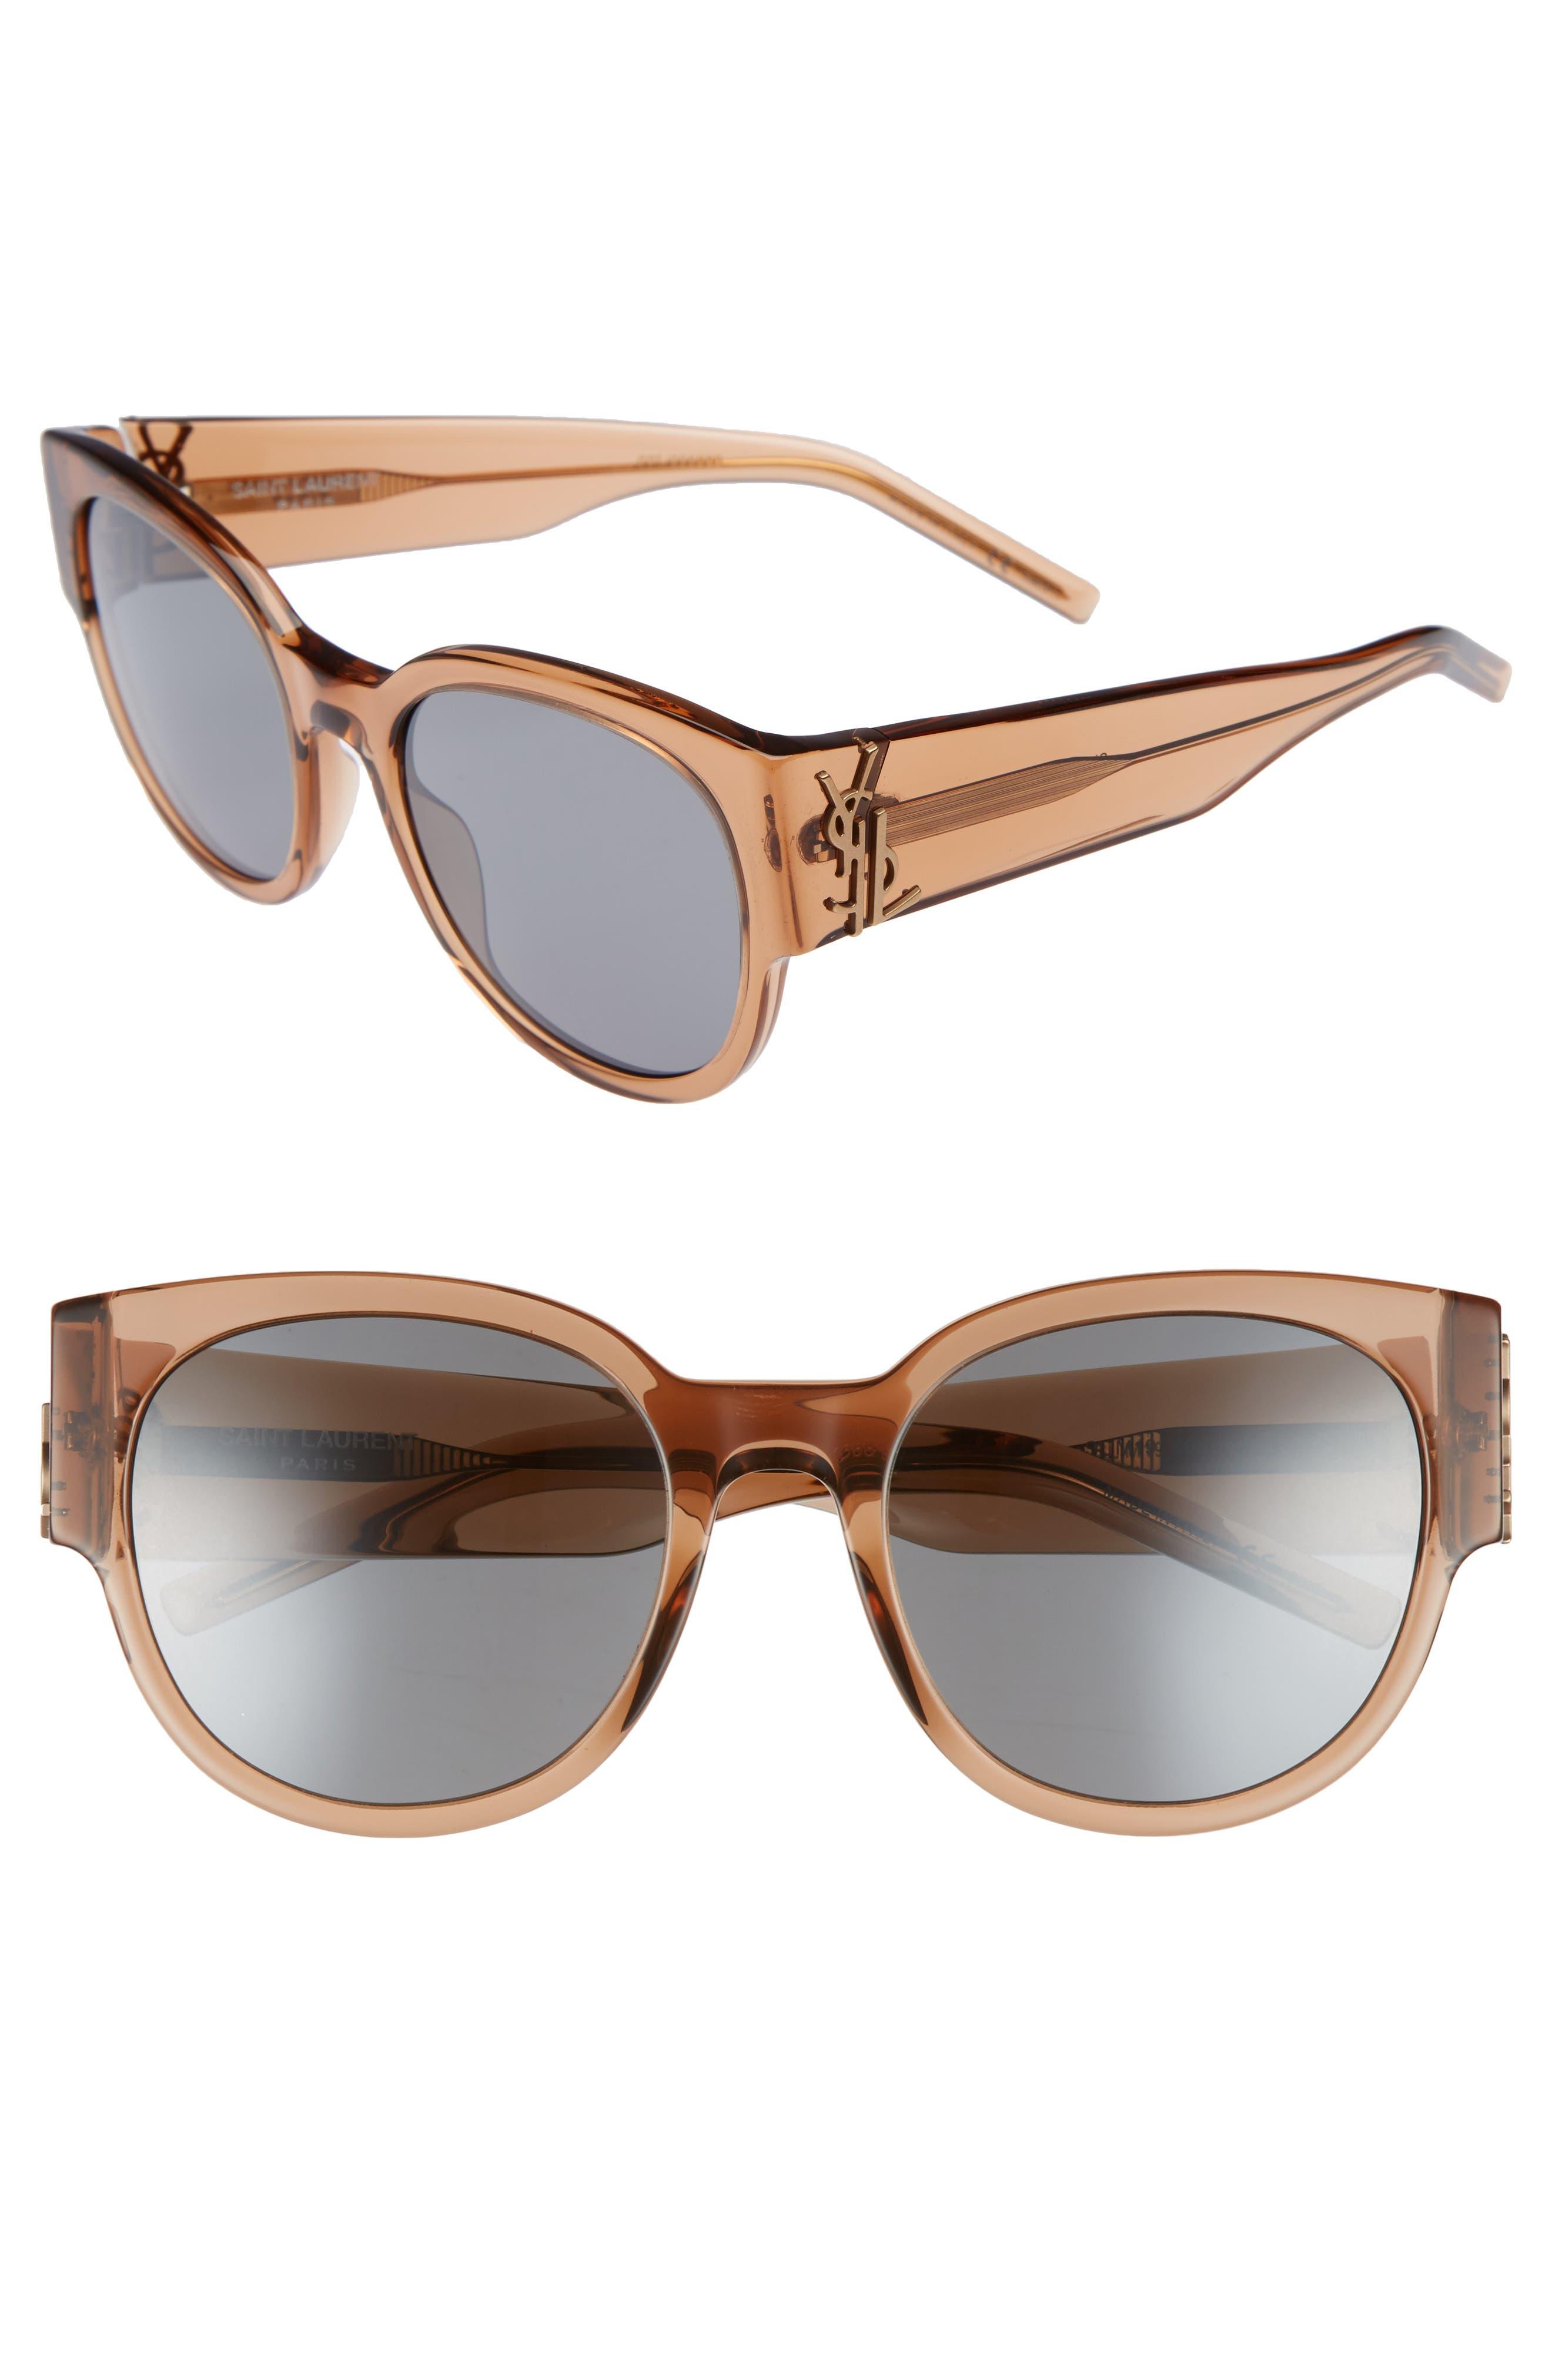 SL M19 54mm Cat Eye Sunglasses,                             Main thumbnail 1, color,                             NUDE